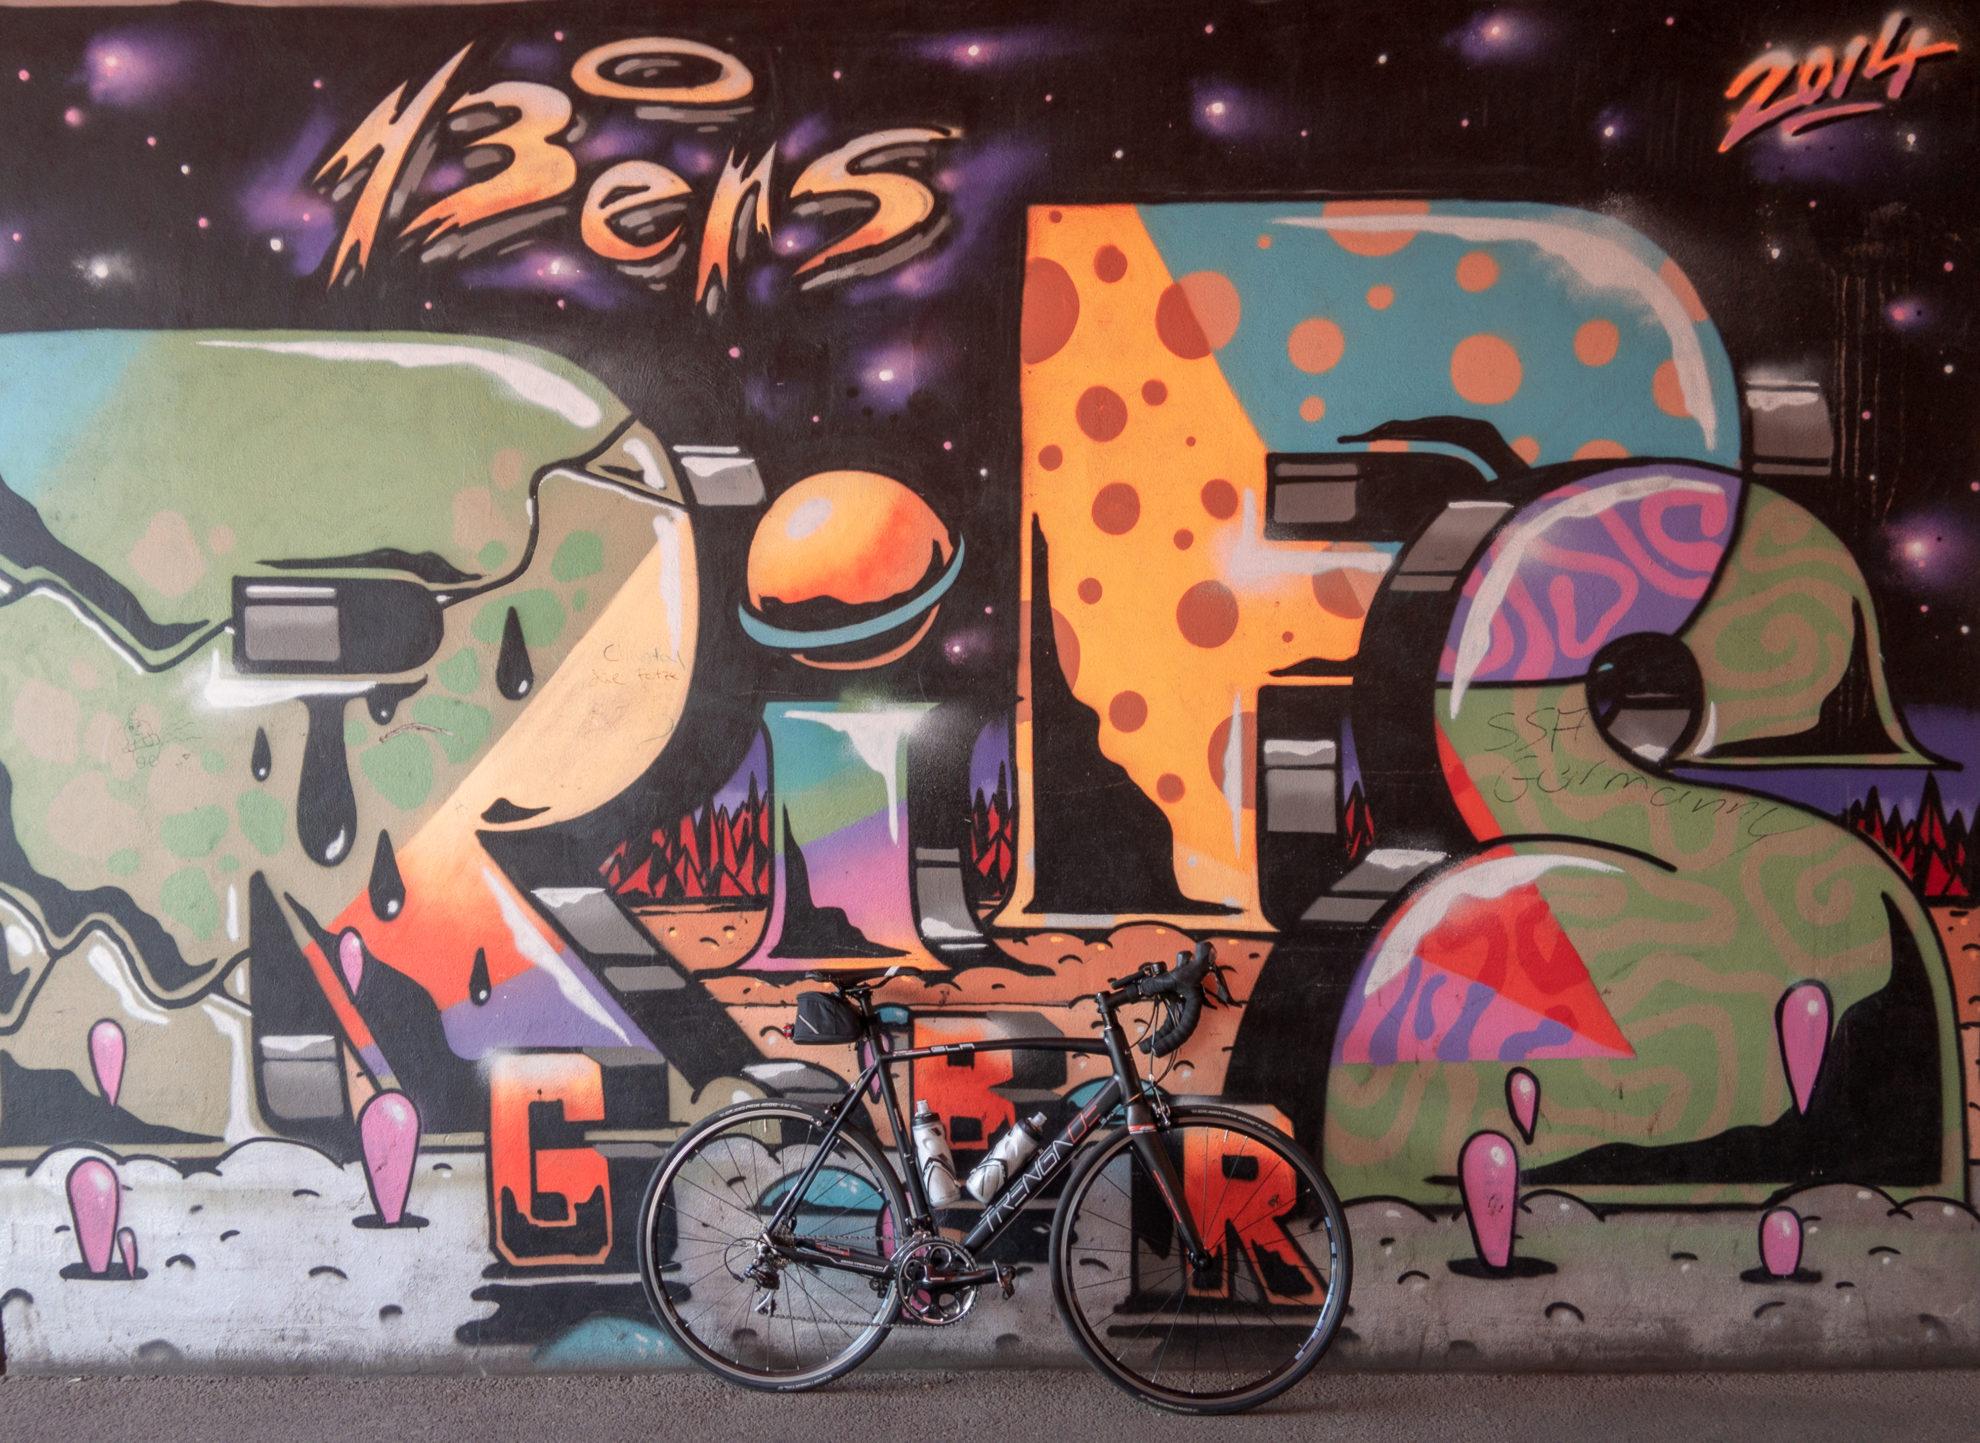 Graffiti im Tunnel der S-Bahnstation Stellingen